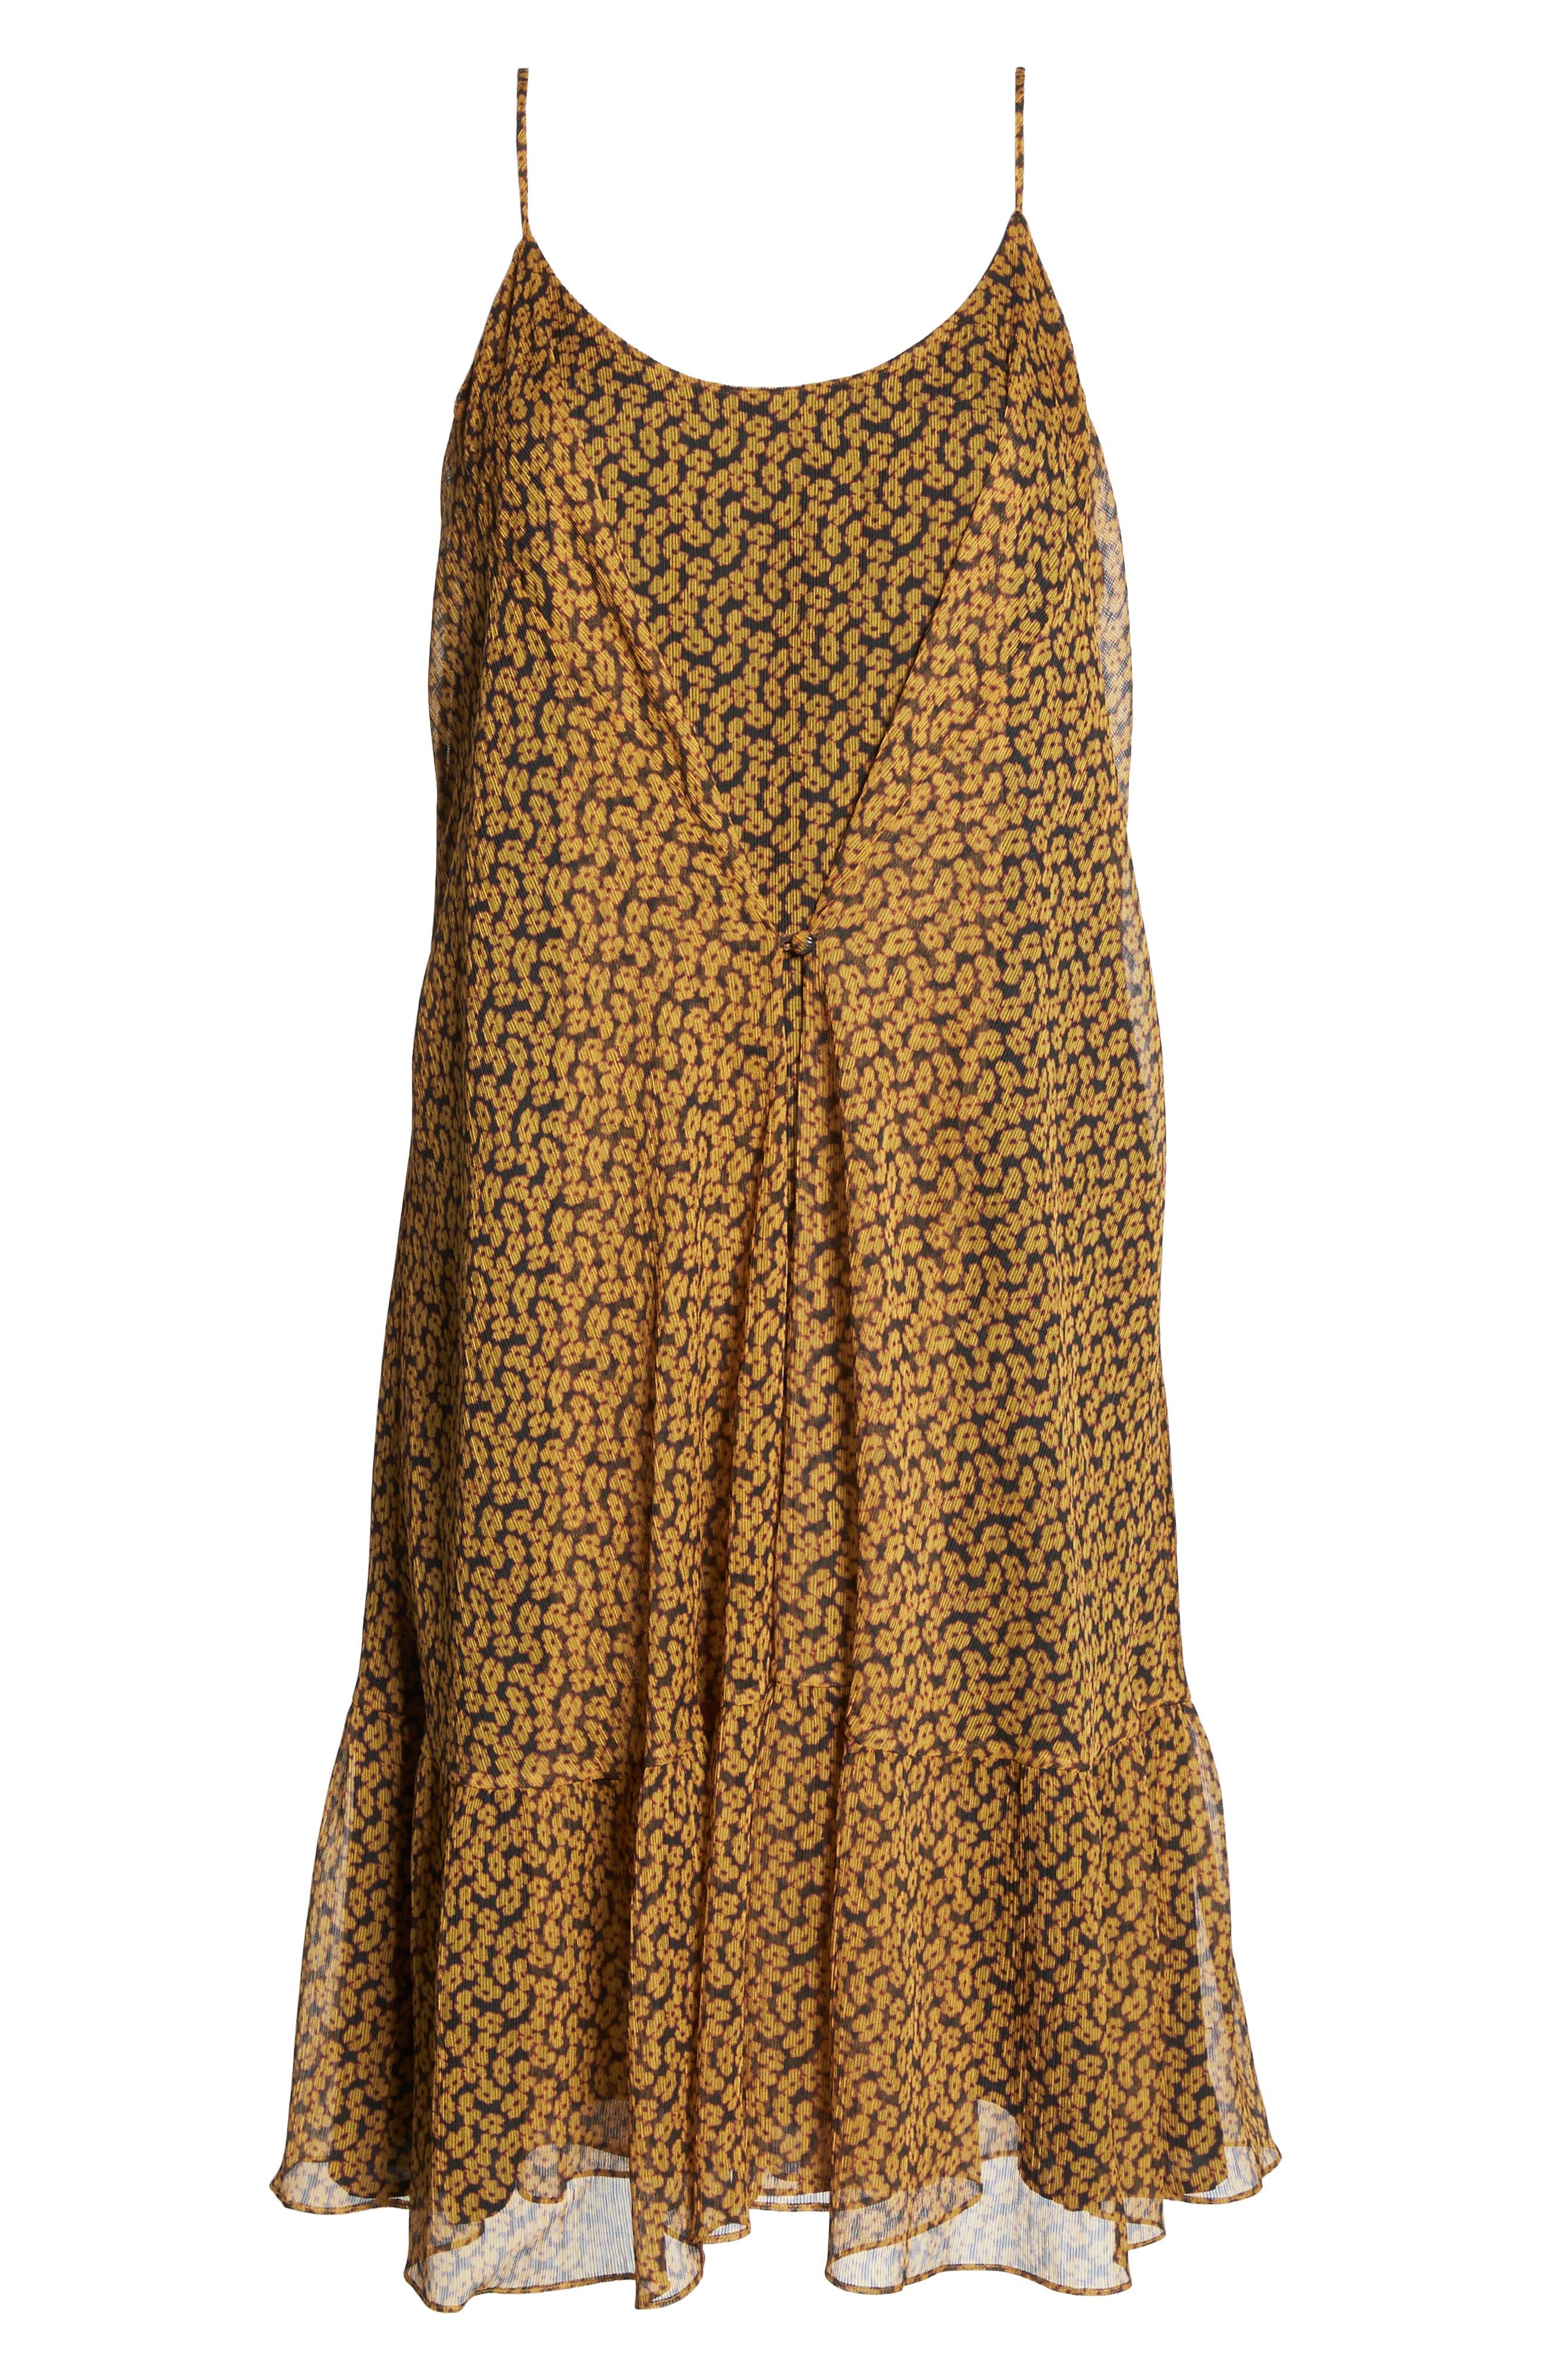 Floral Chiffon Tank Dress,                             Alternate thumbnail 7, color,                             MARIGOLD